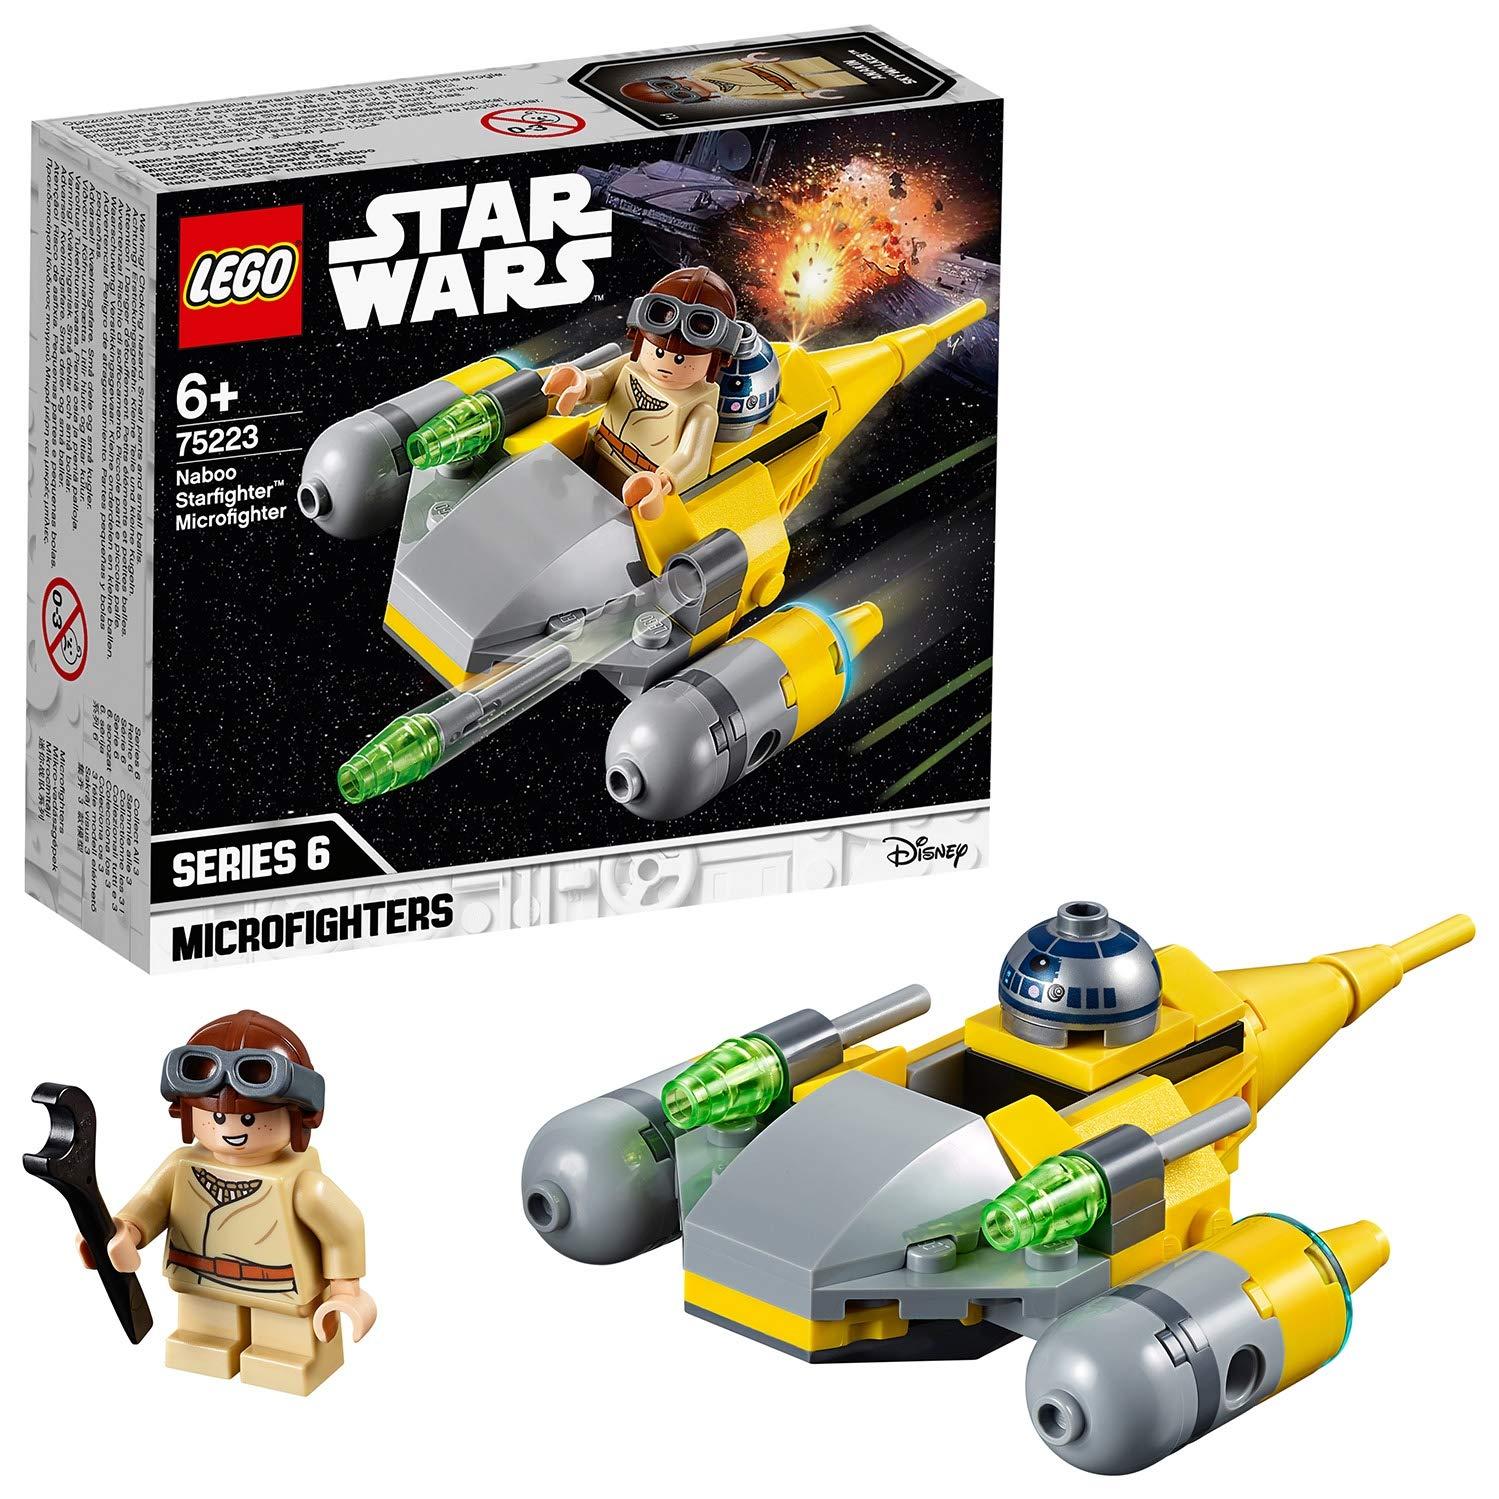 LEGO 75223 Star Wars Microfighters now £6.54 (Prime) + £4.49 (non Prime) at Amazon